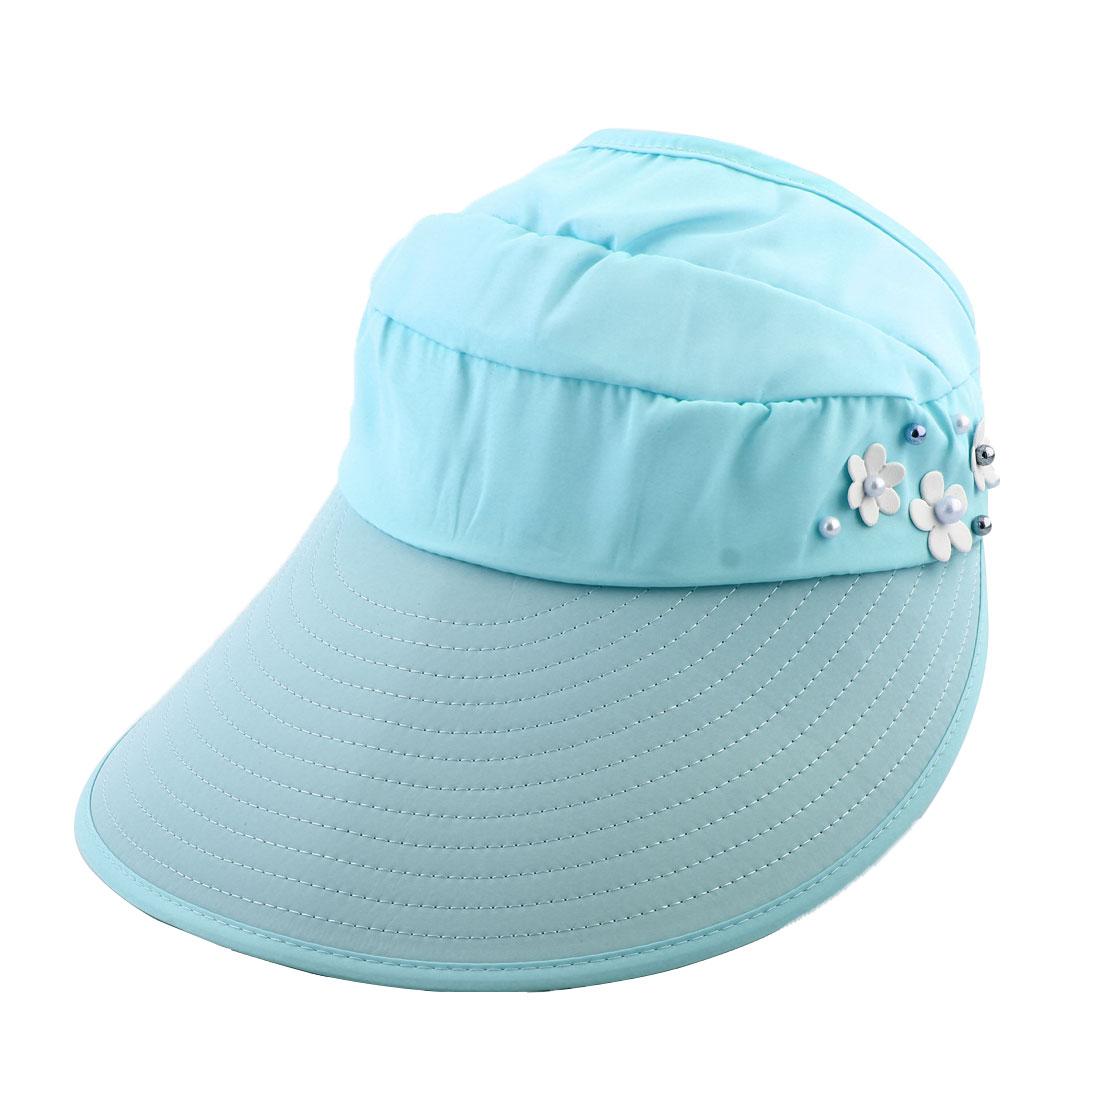 Woman Imitation Pearl Flower Decor Adjustable Summer Beach Floppy Cap Sun Visor Hat Light Blue